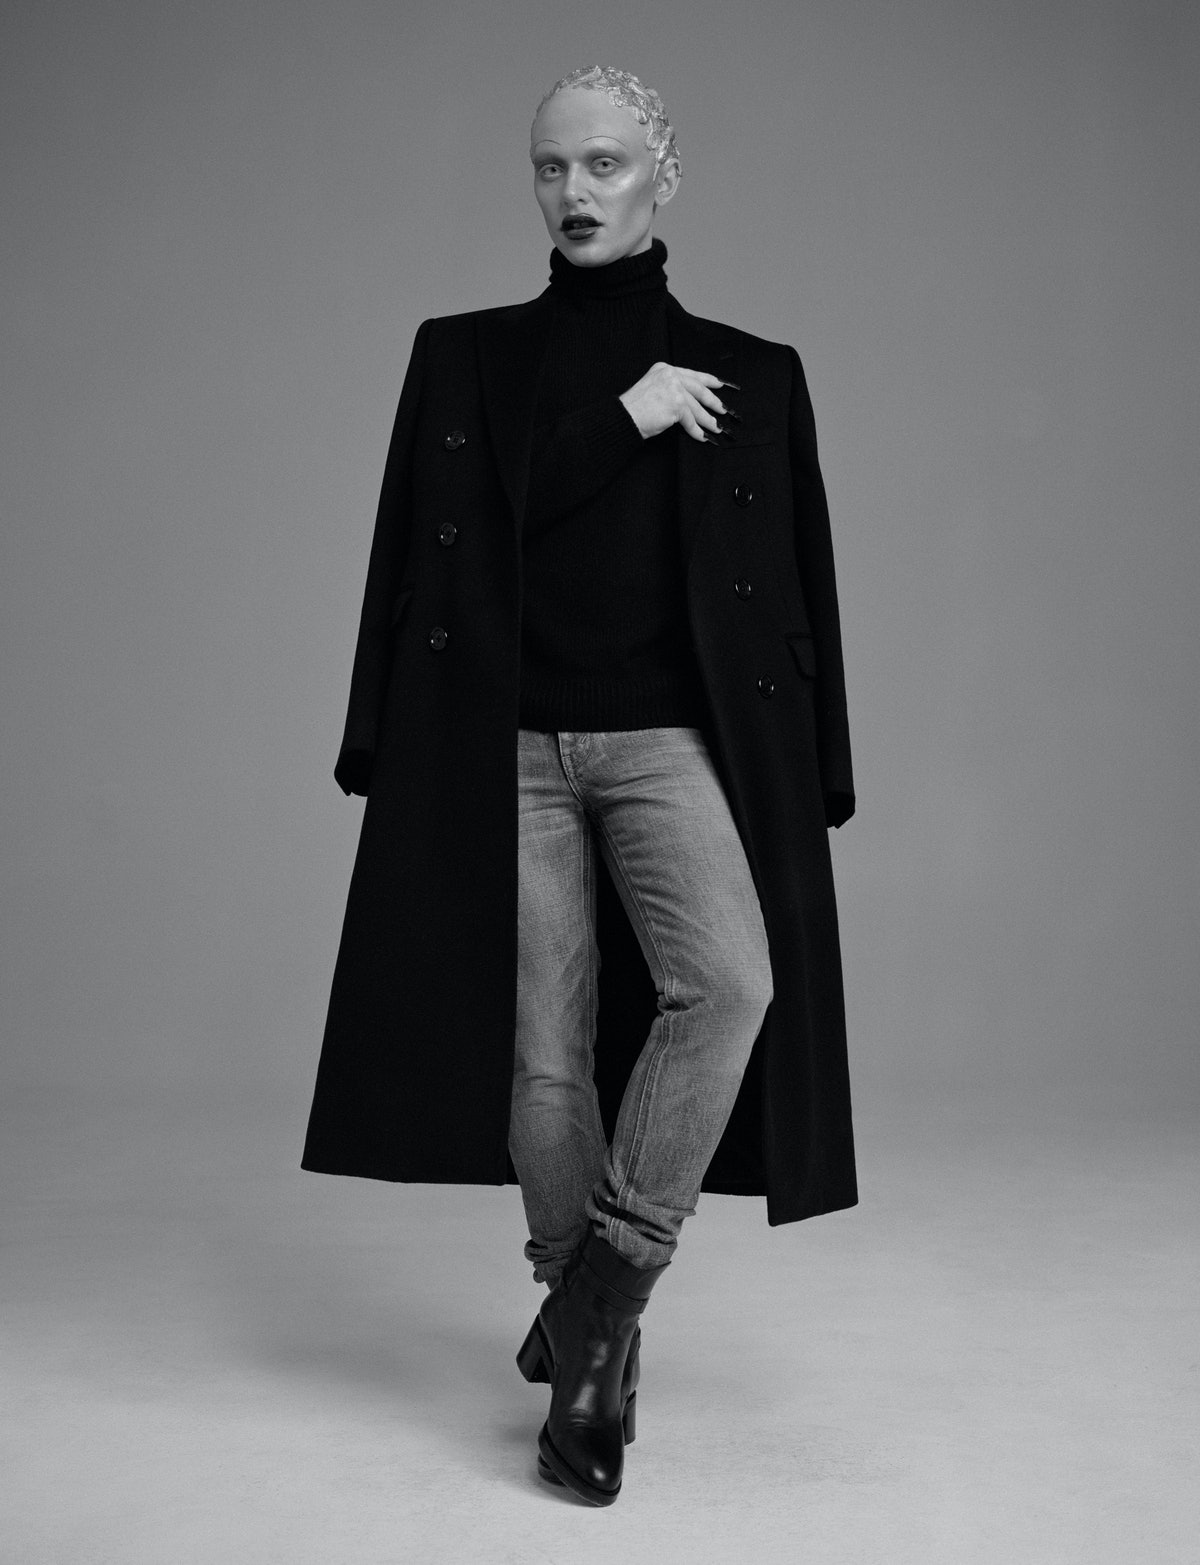 Bimini Bon Boulash wears a Celine by Hedi Slimane coat, sweater, jeans, and boots.